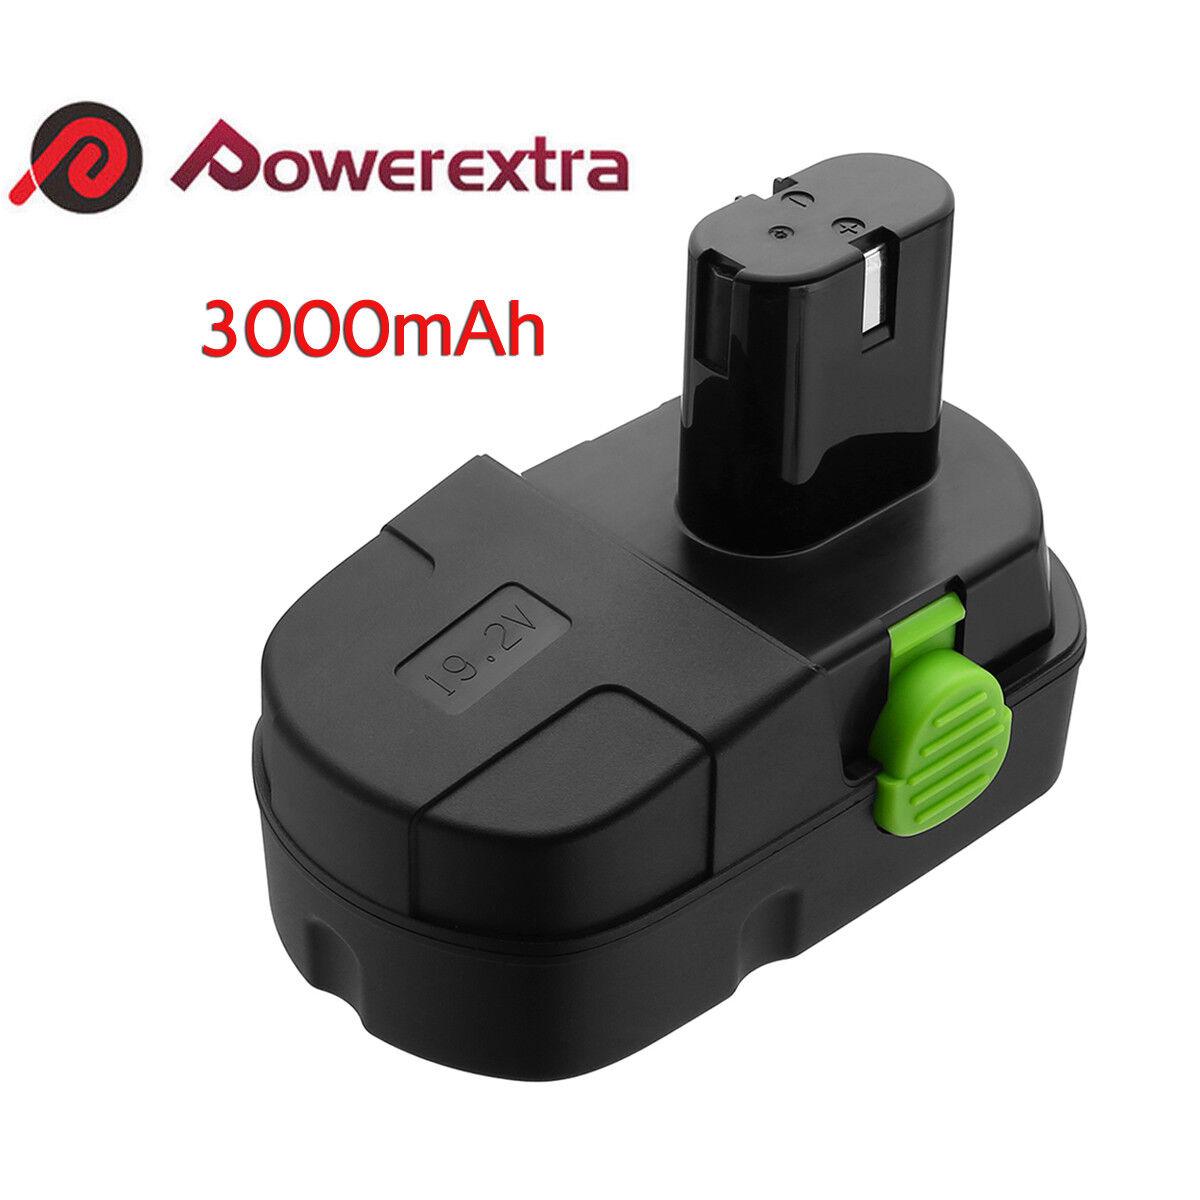 19.2V 3000mAh NiMH Battery for Kawasaki 840045 19.2Volt Unis